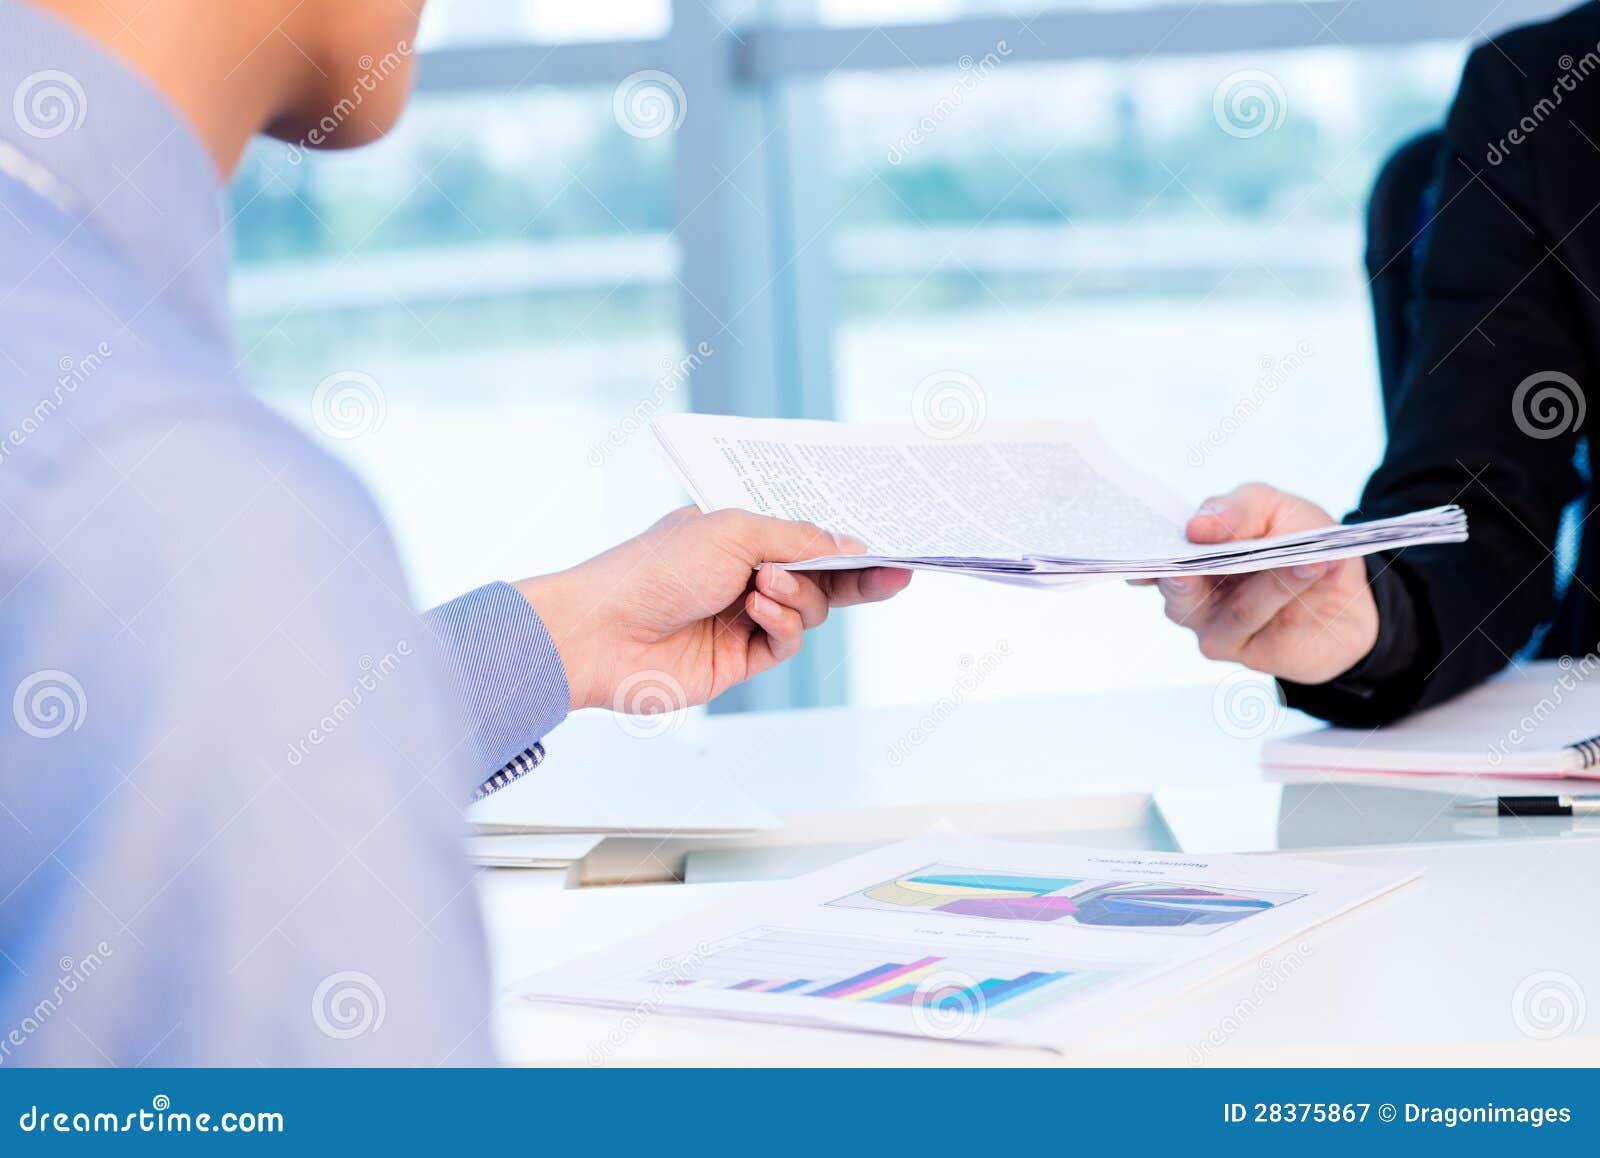 referral document